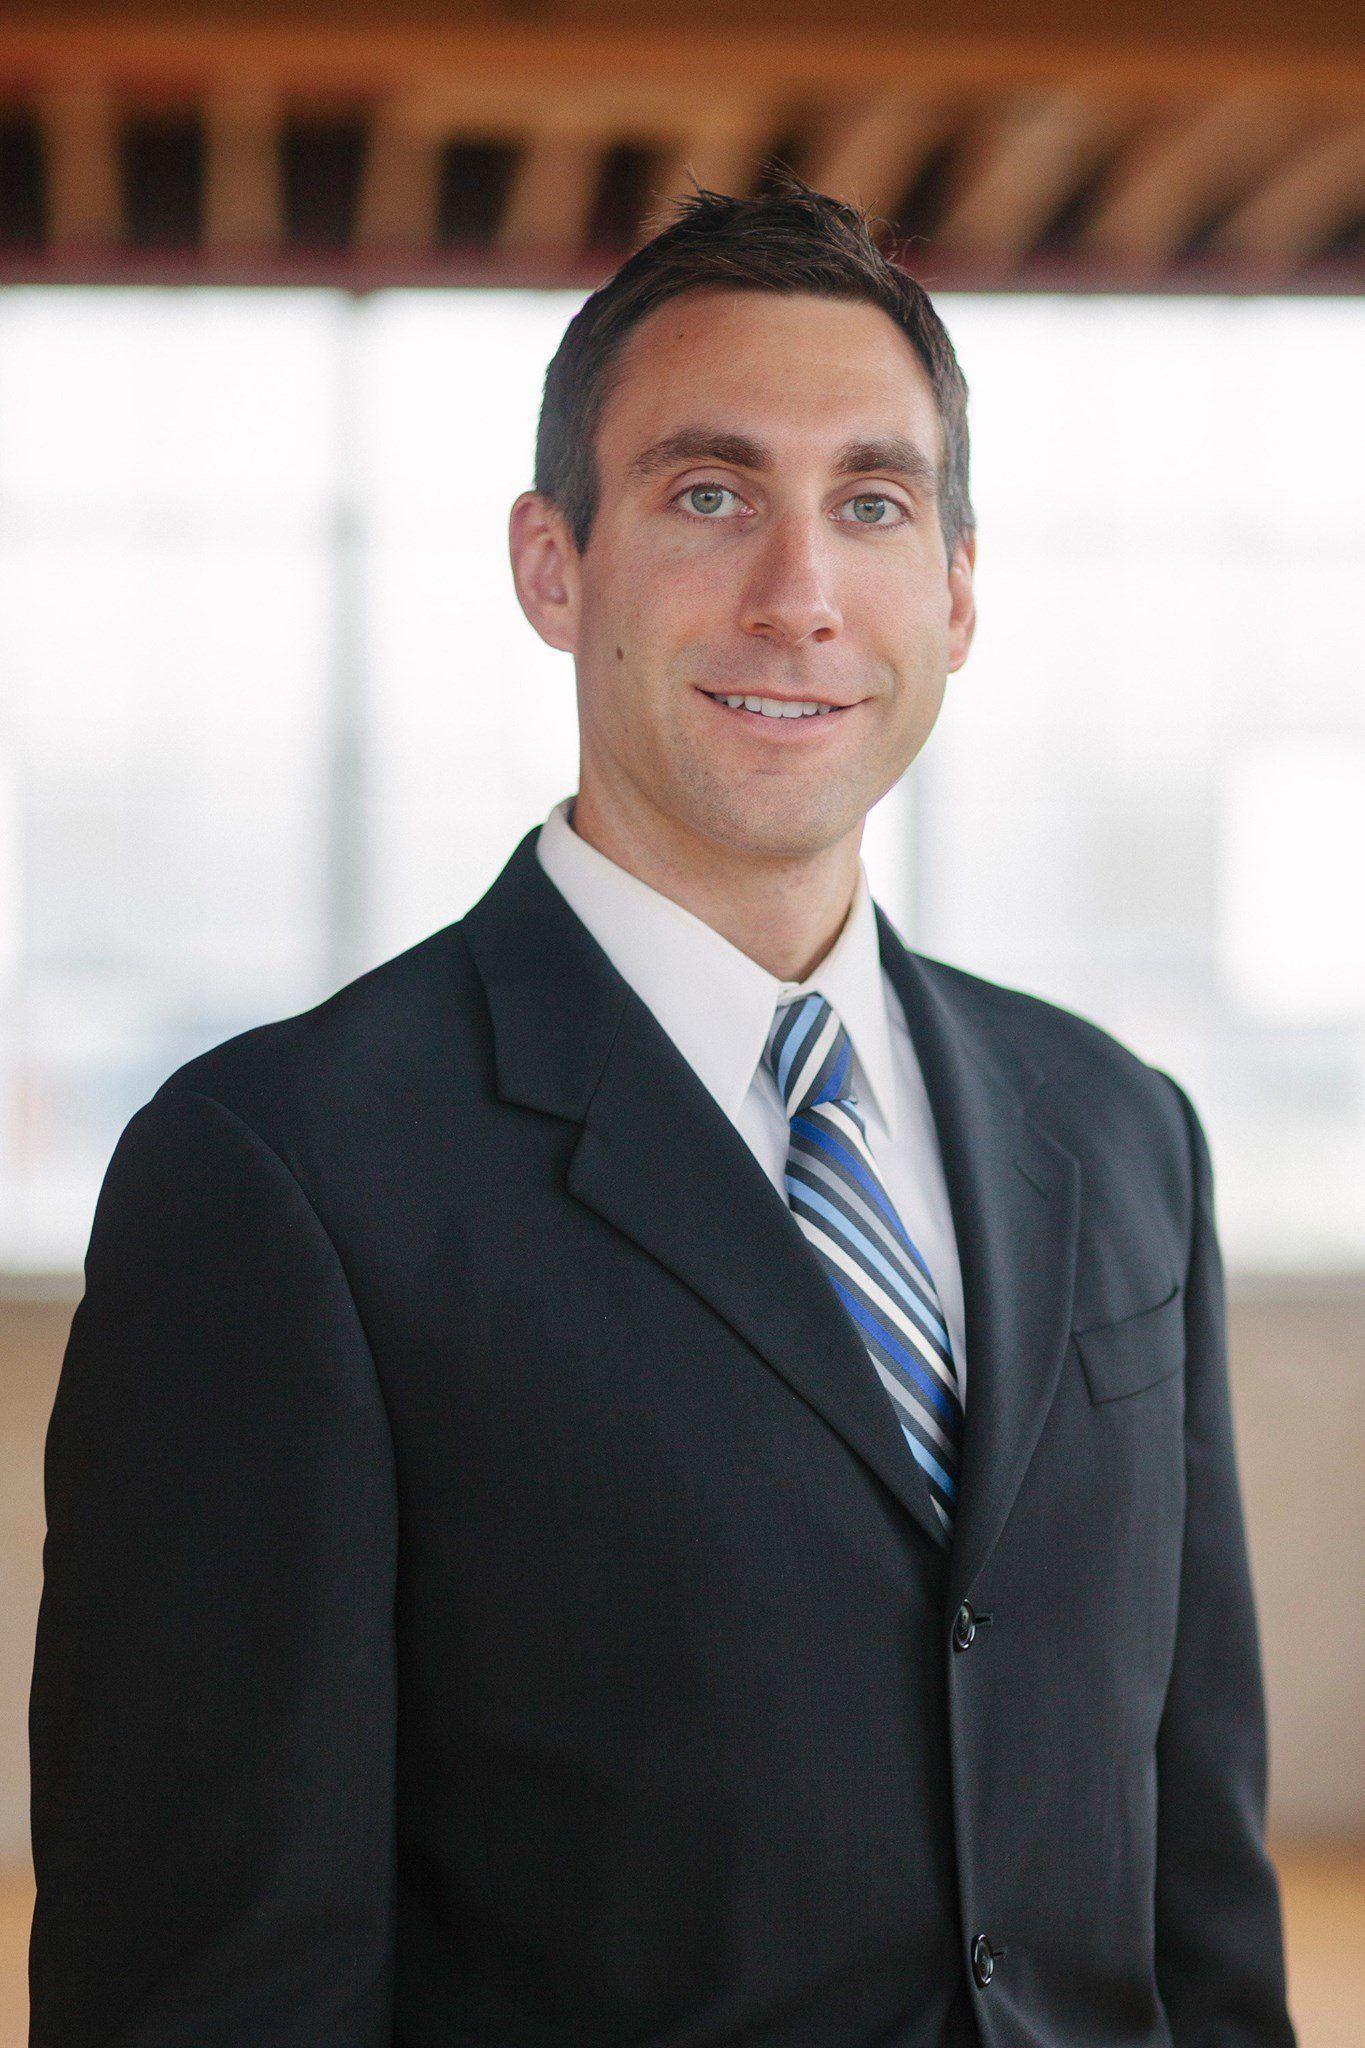 Tyler Addington